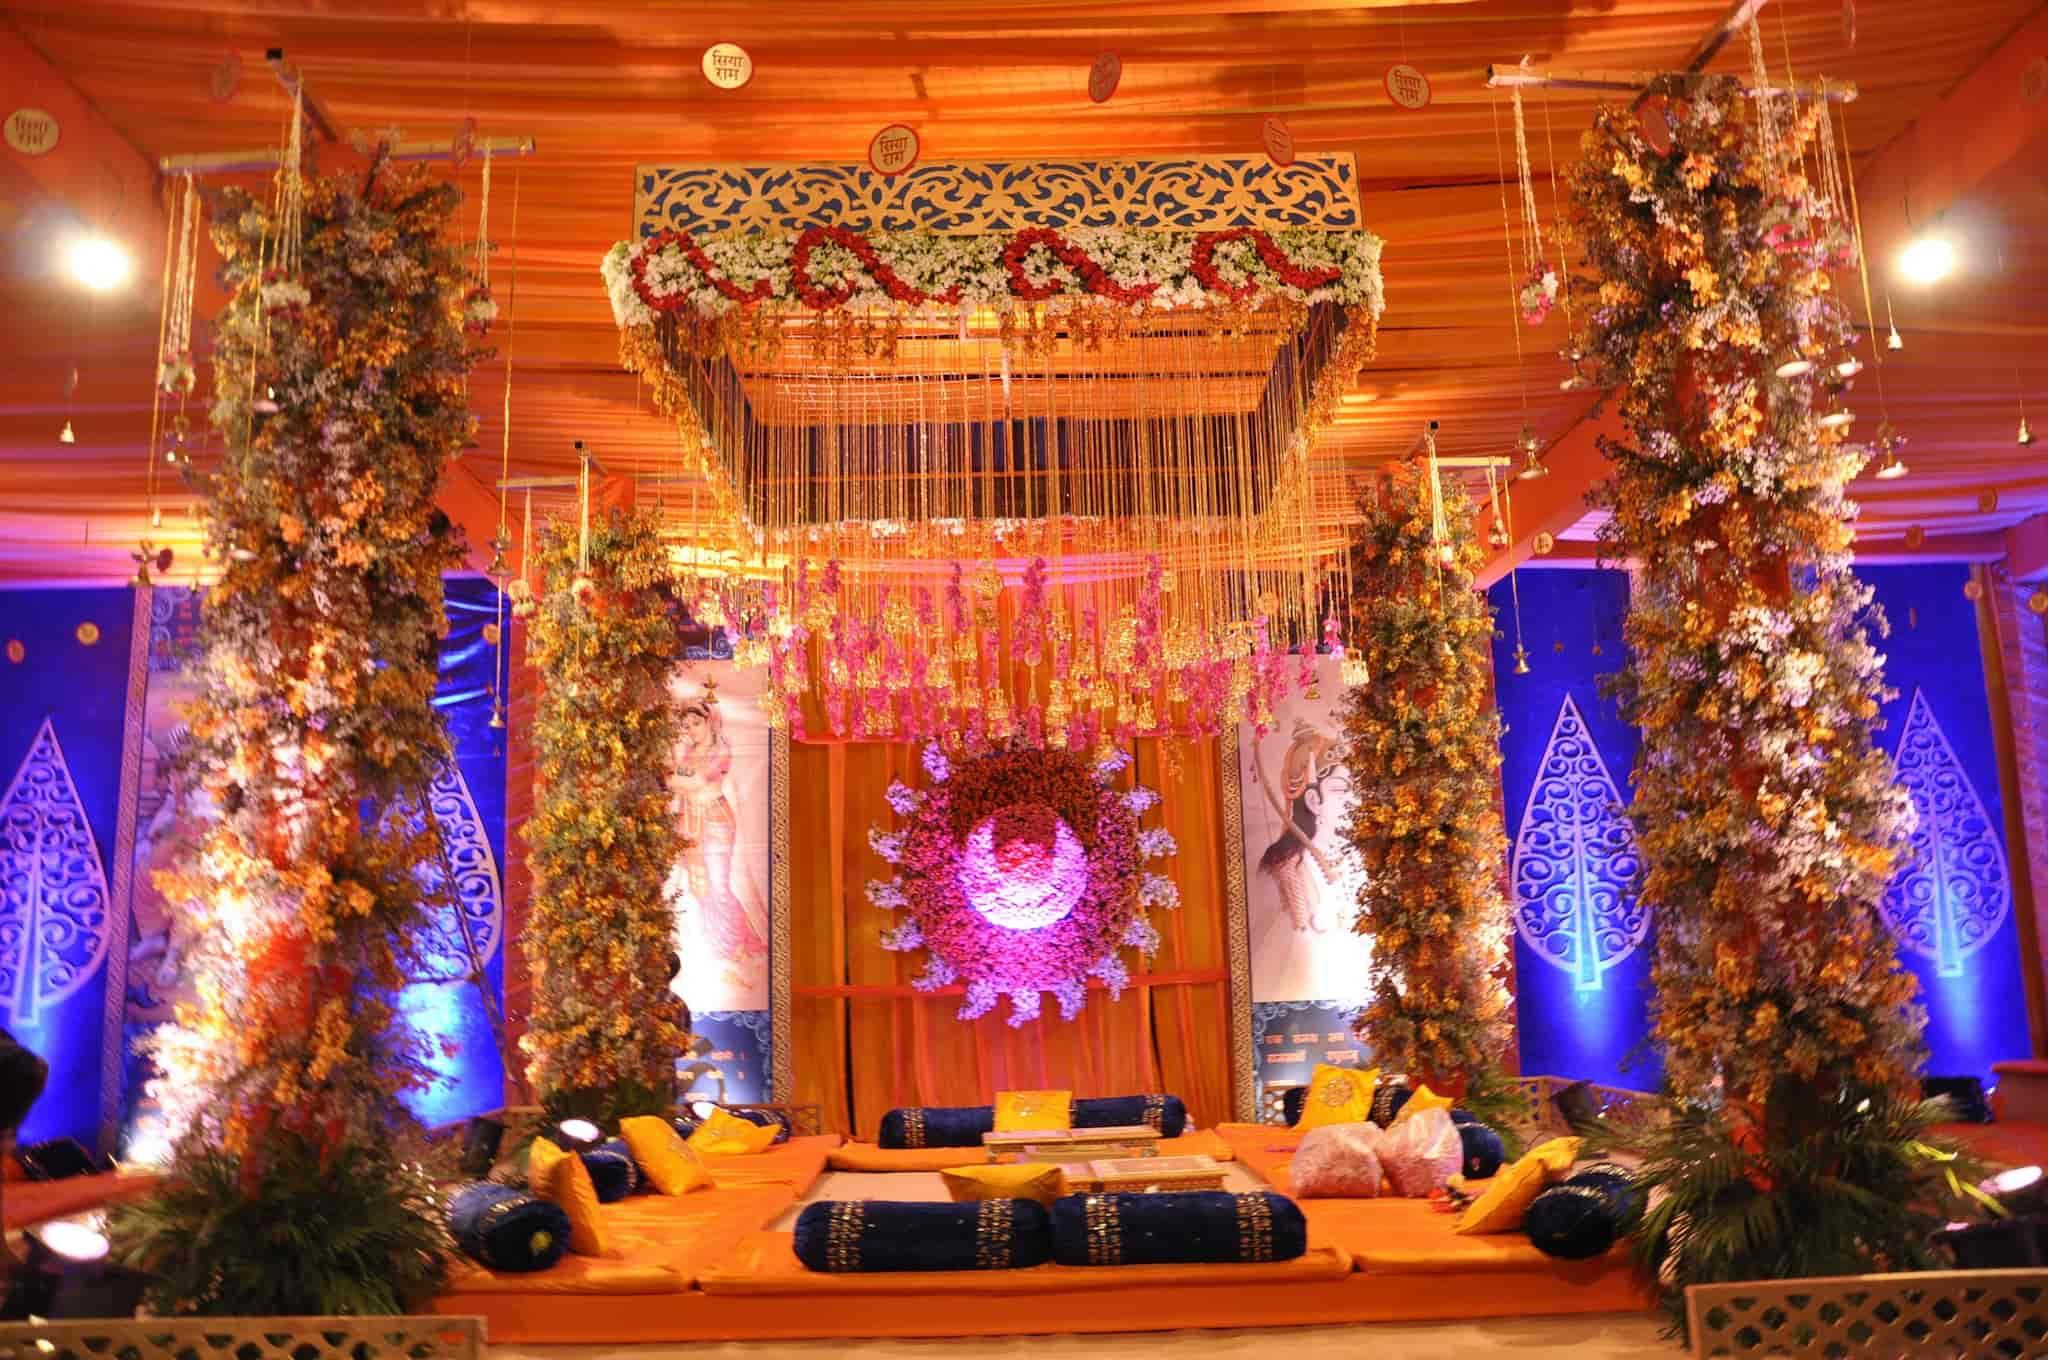 Magnifique events productions photos pakhowal road ludhiana wedding decoration magnifique events productions photos pakhowal road ludhiana event organisers junglespirit Choice Image